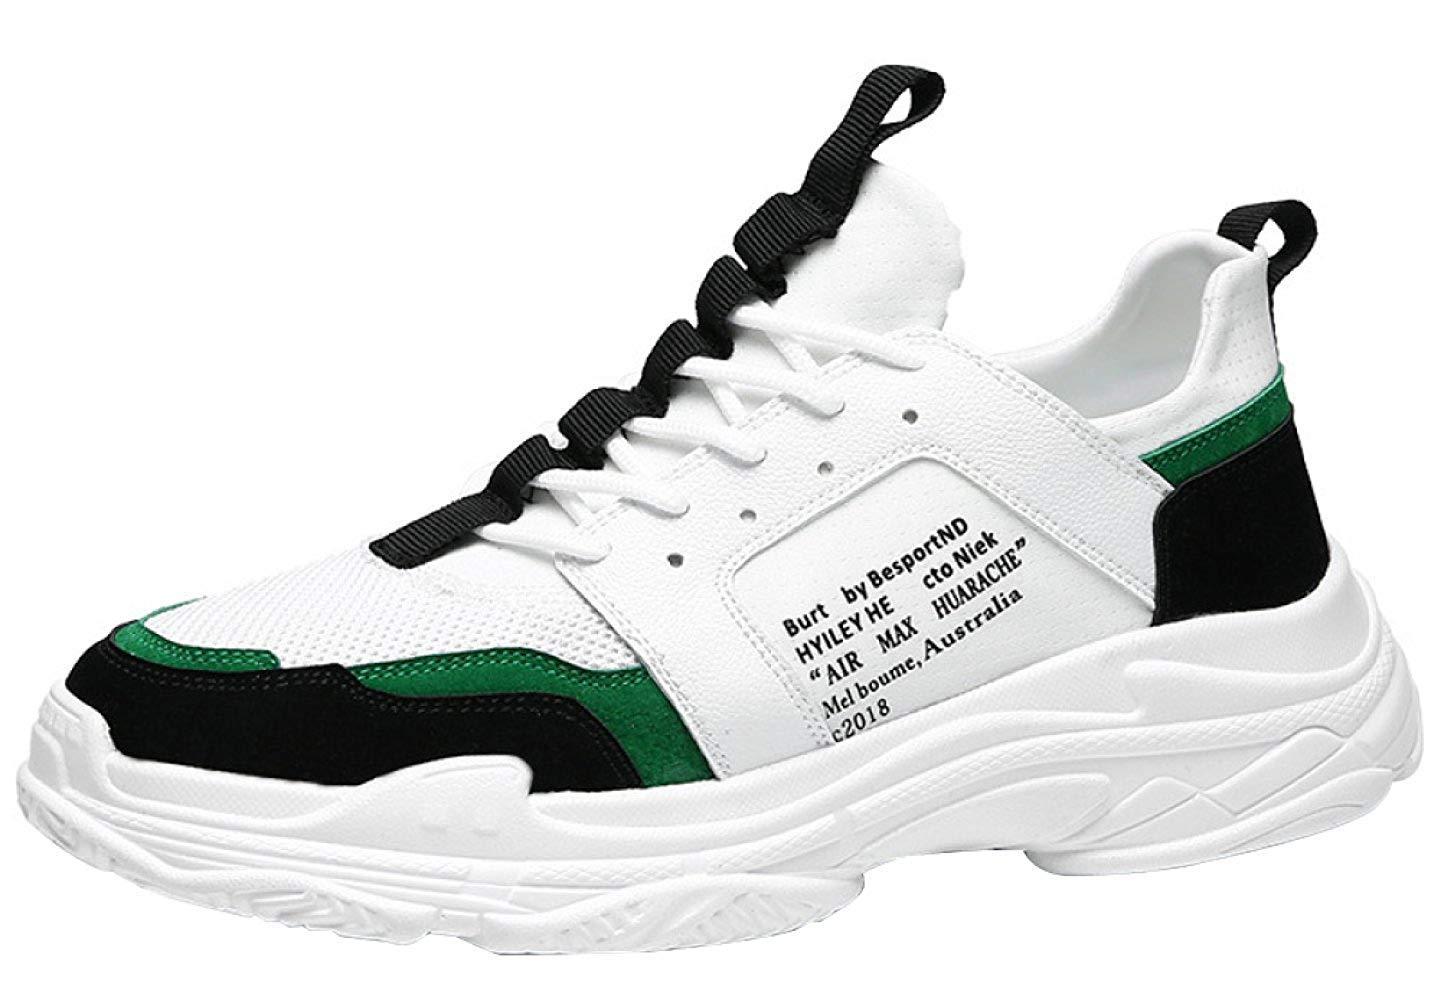 FuweiEncore Herrenmode Sportschuhe Retro-Casual Schuhe Atmungsaktives Mesh (Farbe   Grün, Größe   43EU)